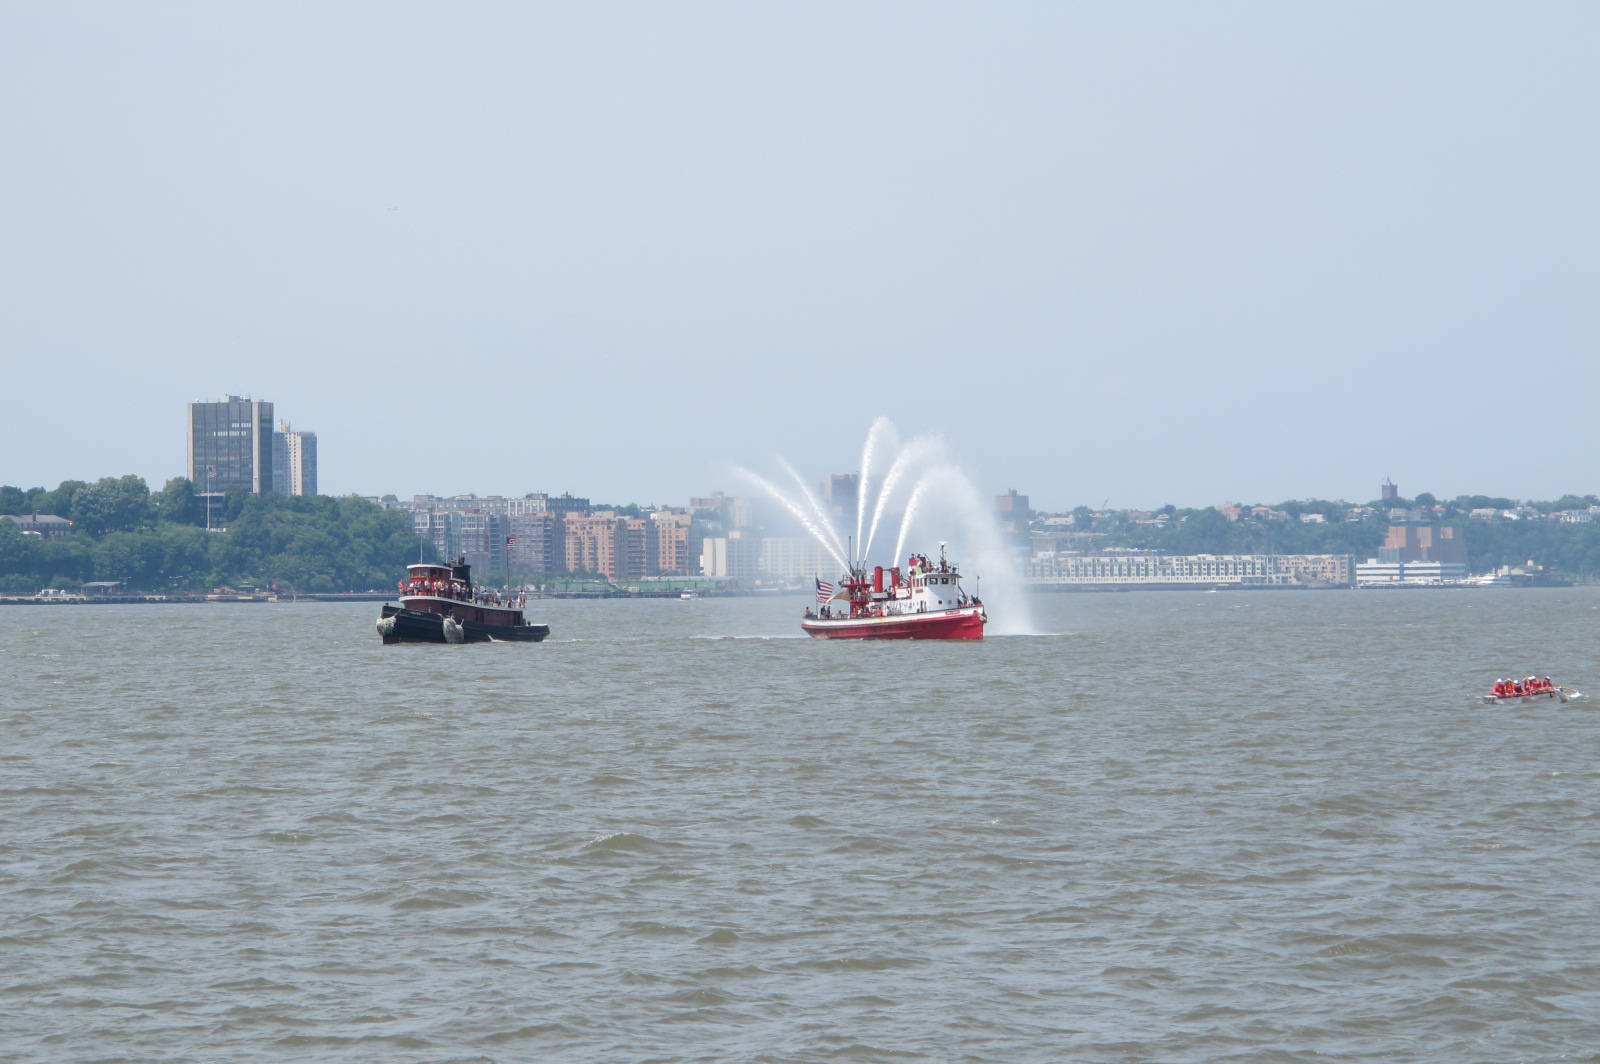 Fireboat John J Harvey & Tugboat Pegusus, 2014